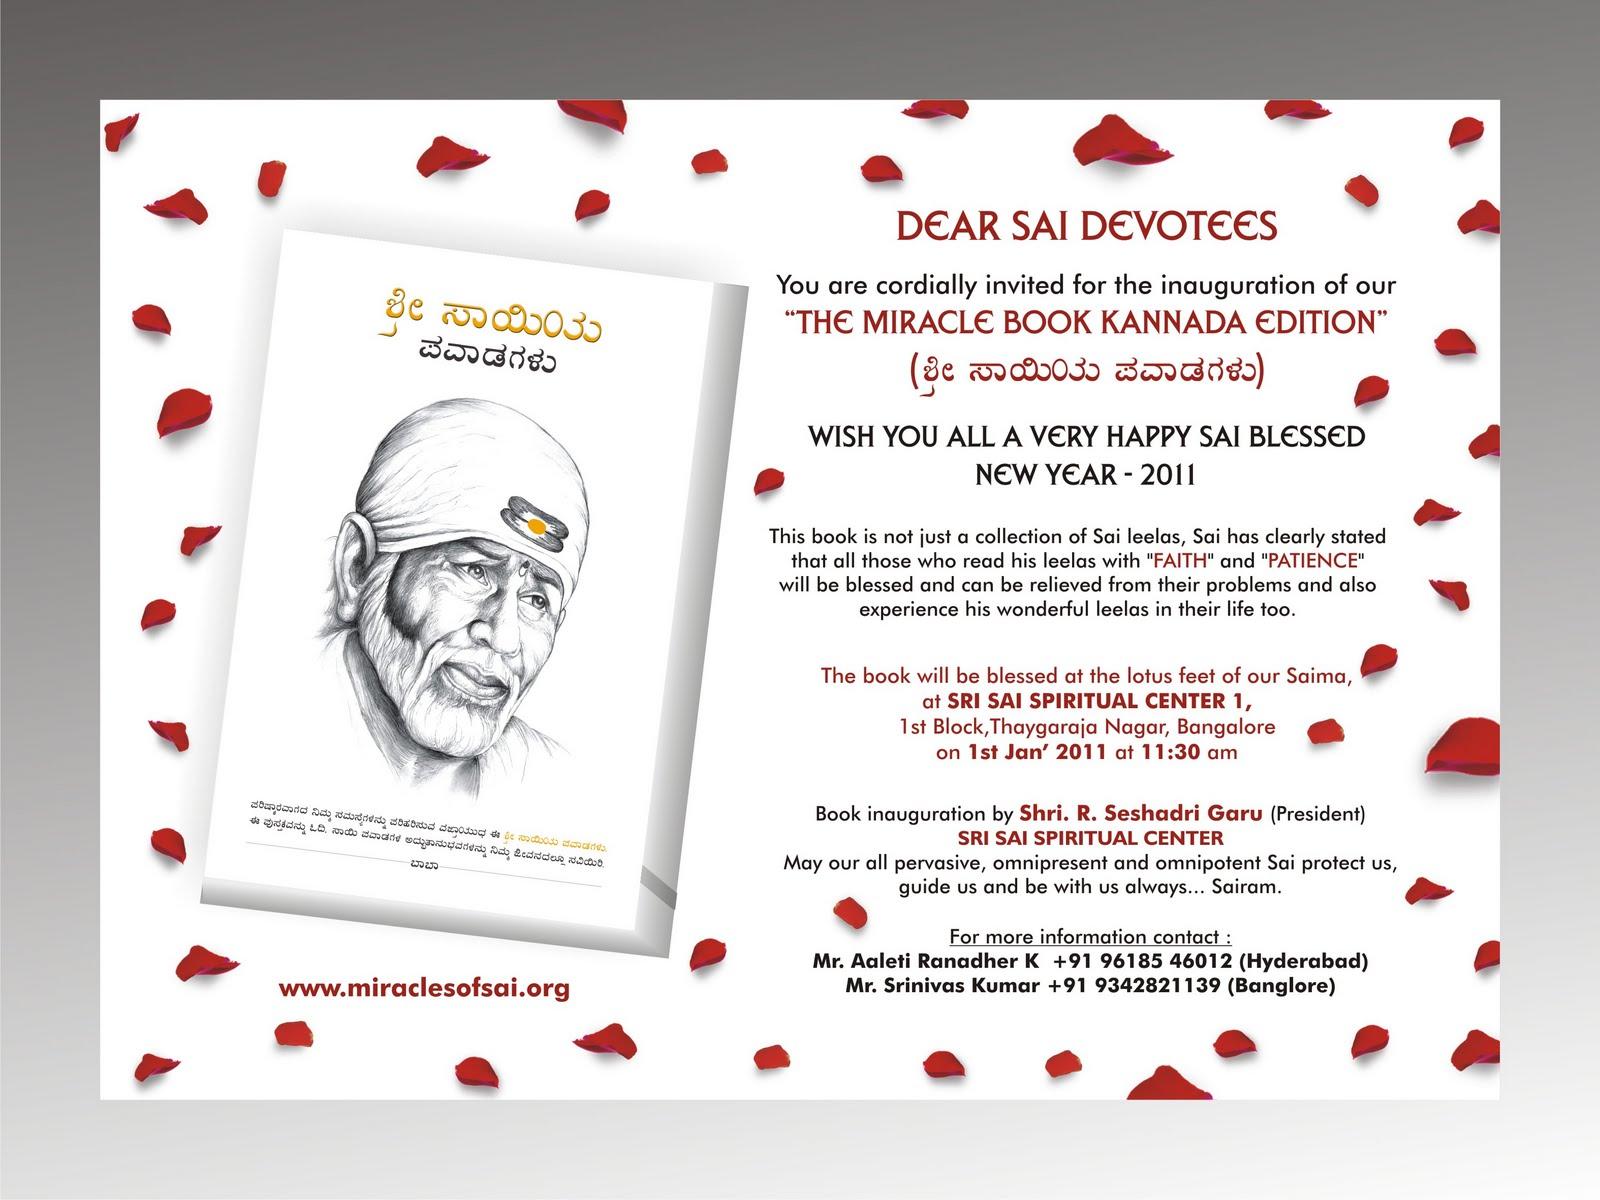 Free Printable Online Wedding Invitations Templates with nice invitation ideas